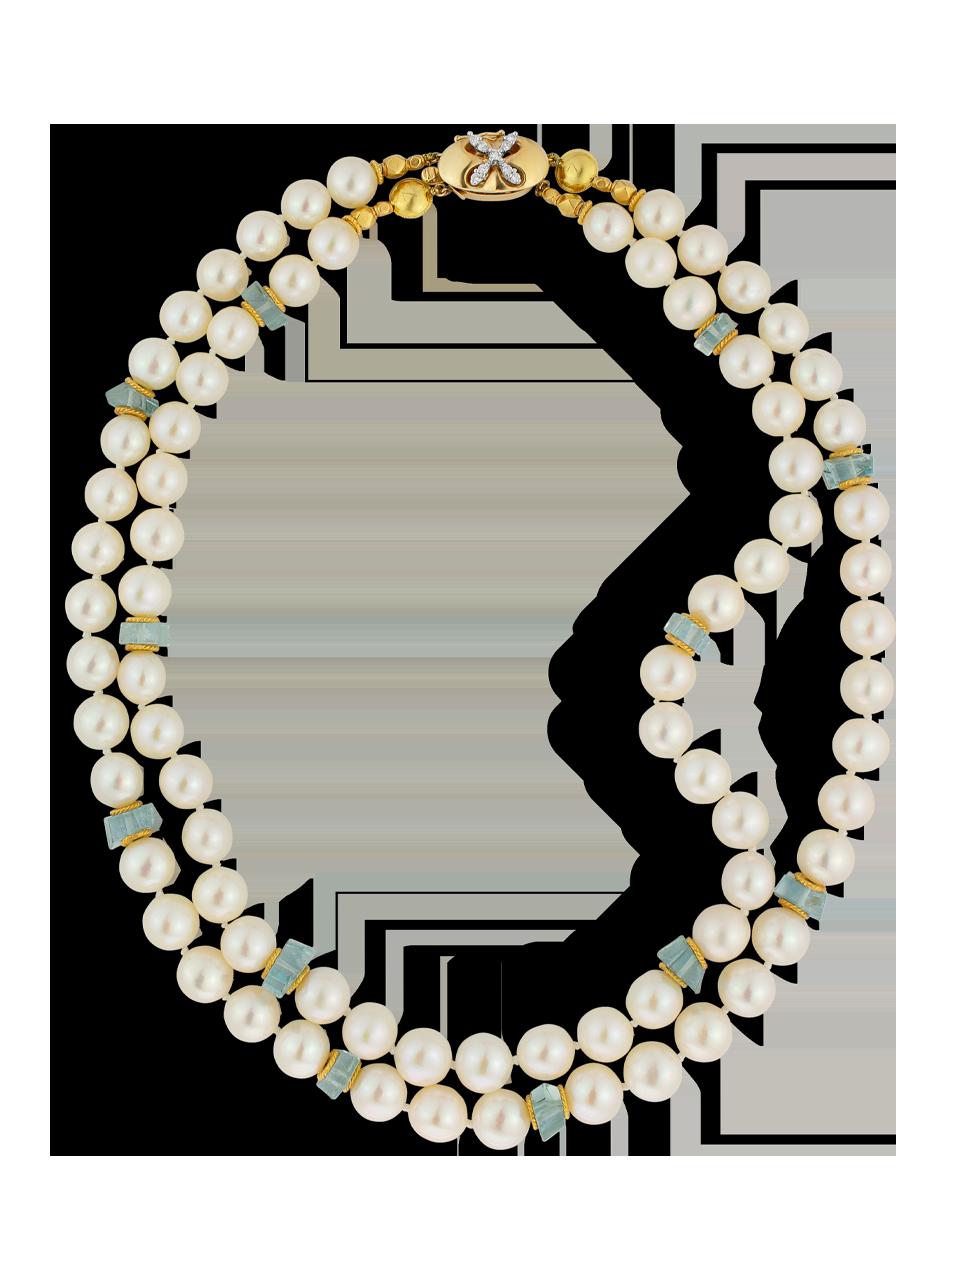 South Sea Pearl & Aquamarine Necklace - 2 Strands-1